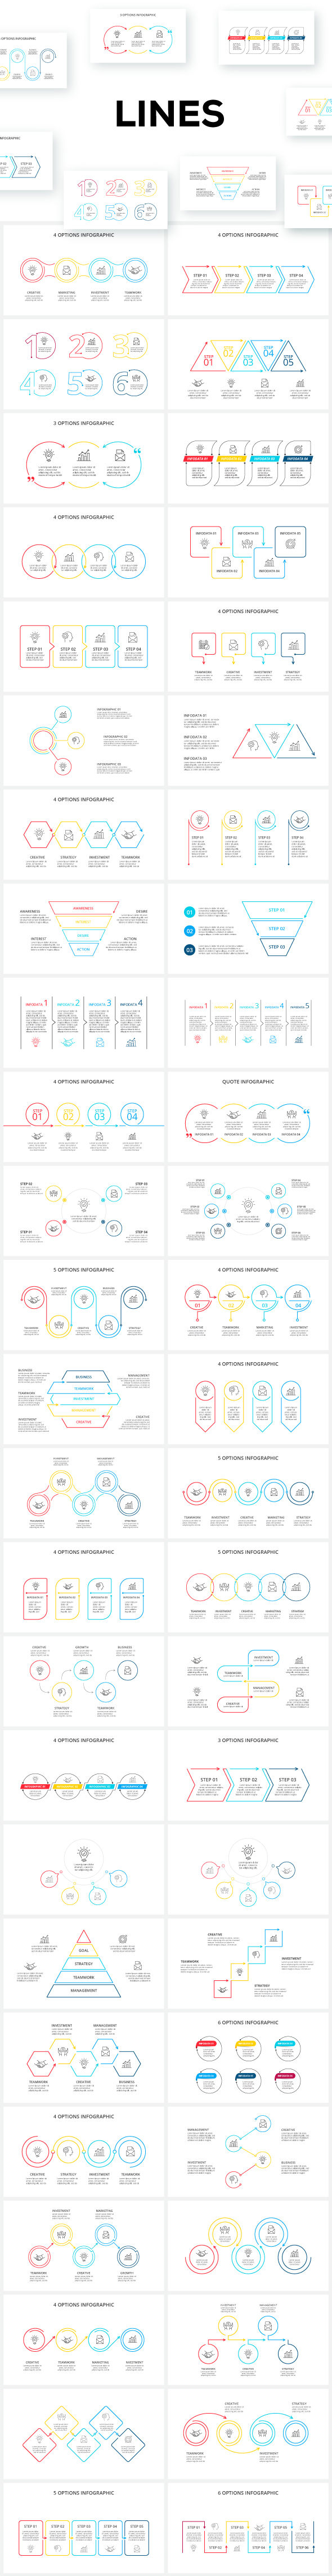 Multipurpose Infographics PowerPoint Templates v.5.0 - 141